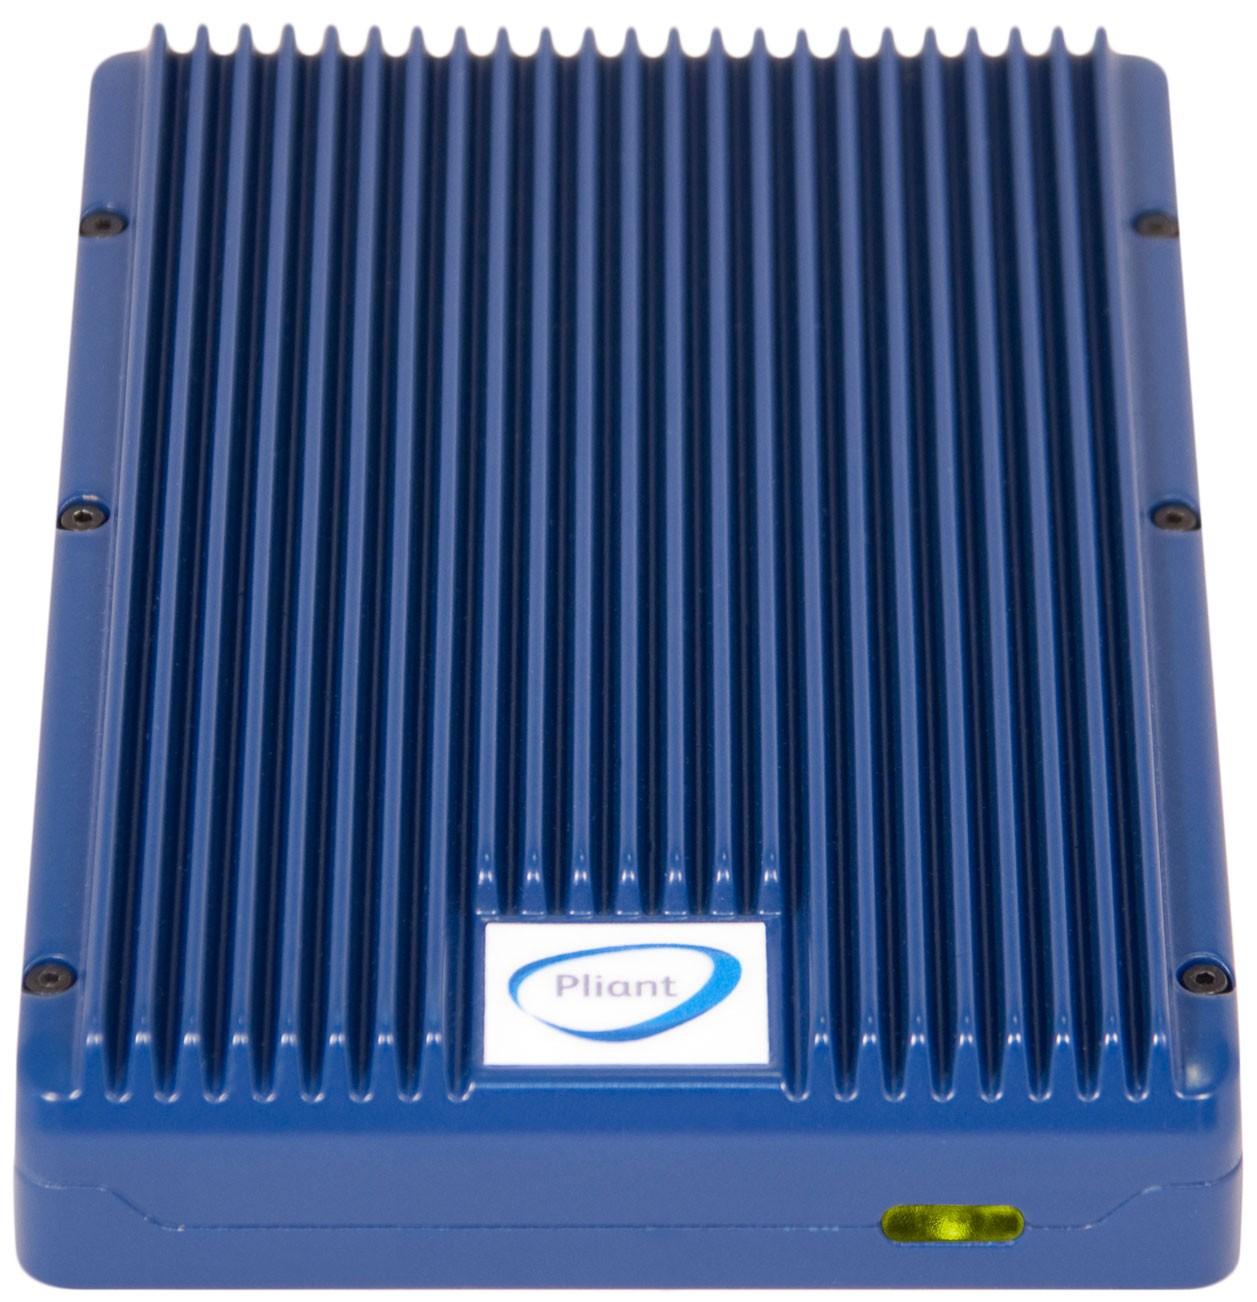 Pliant - Lightning-SSDs mit bis zu 525 MByte/s - Lightning LS im 3,5-Zoll-Format